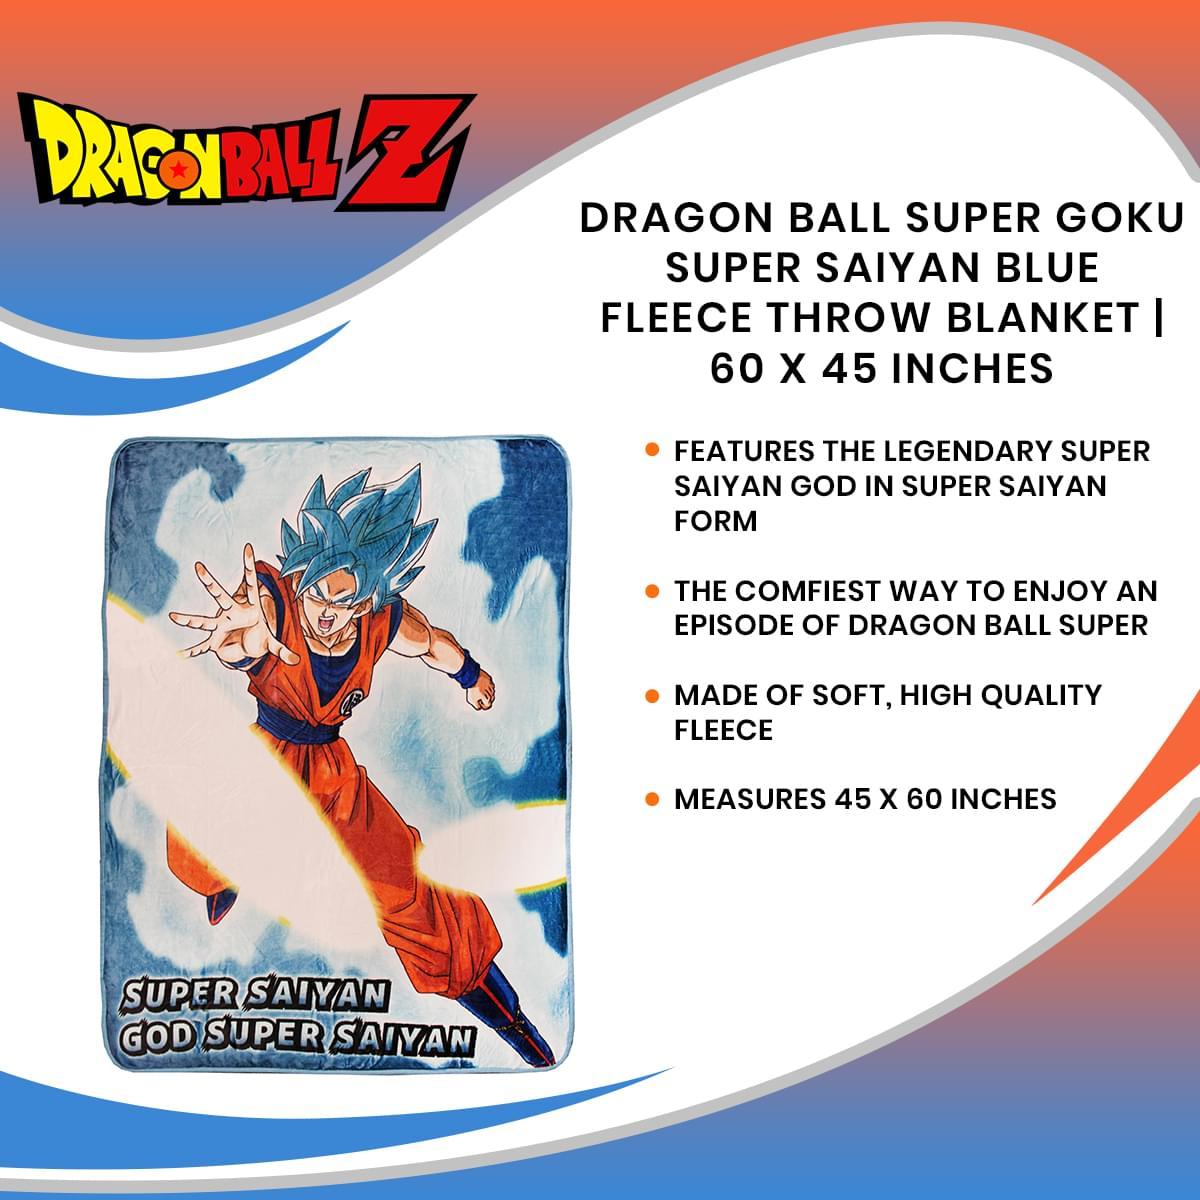 Dragon Ball Super Goku Super Saiyan Blue Fleece Throw ...